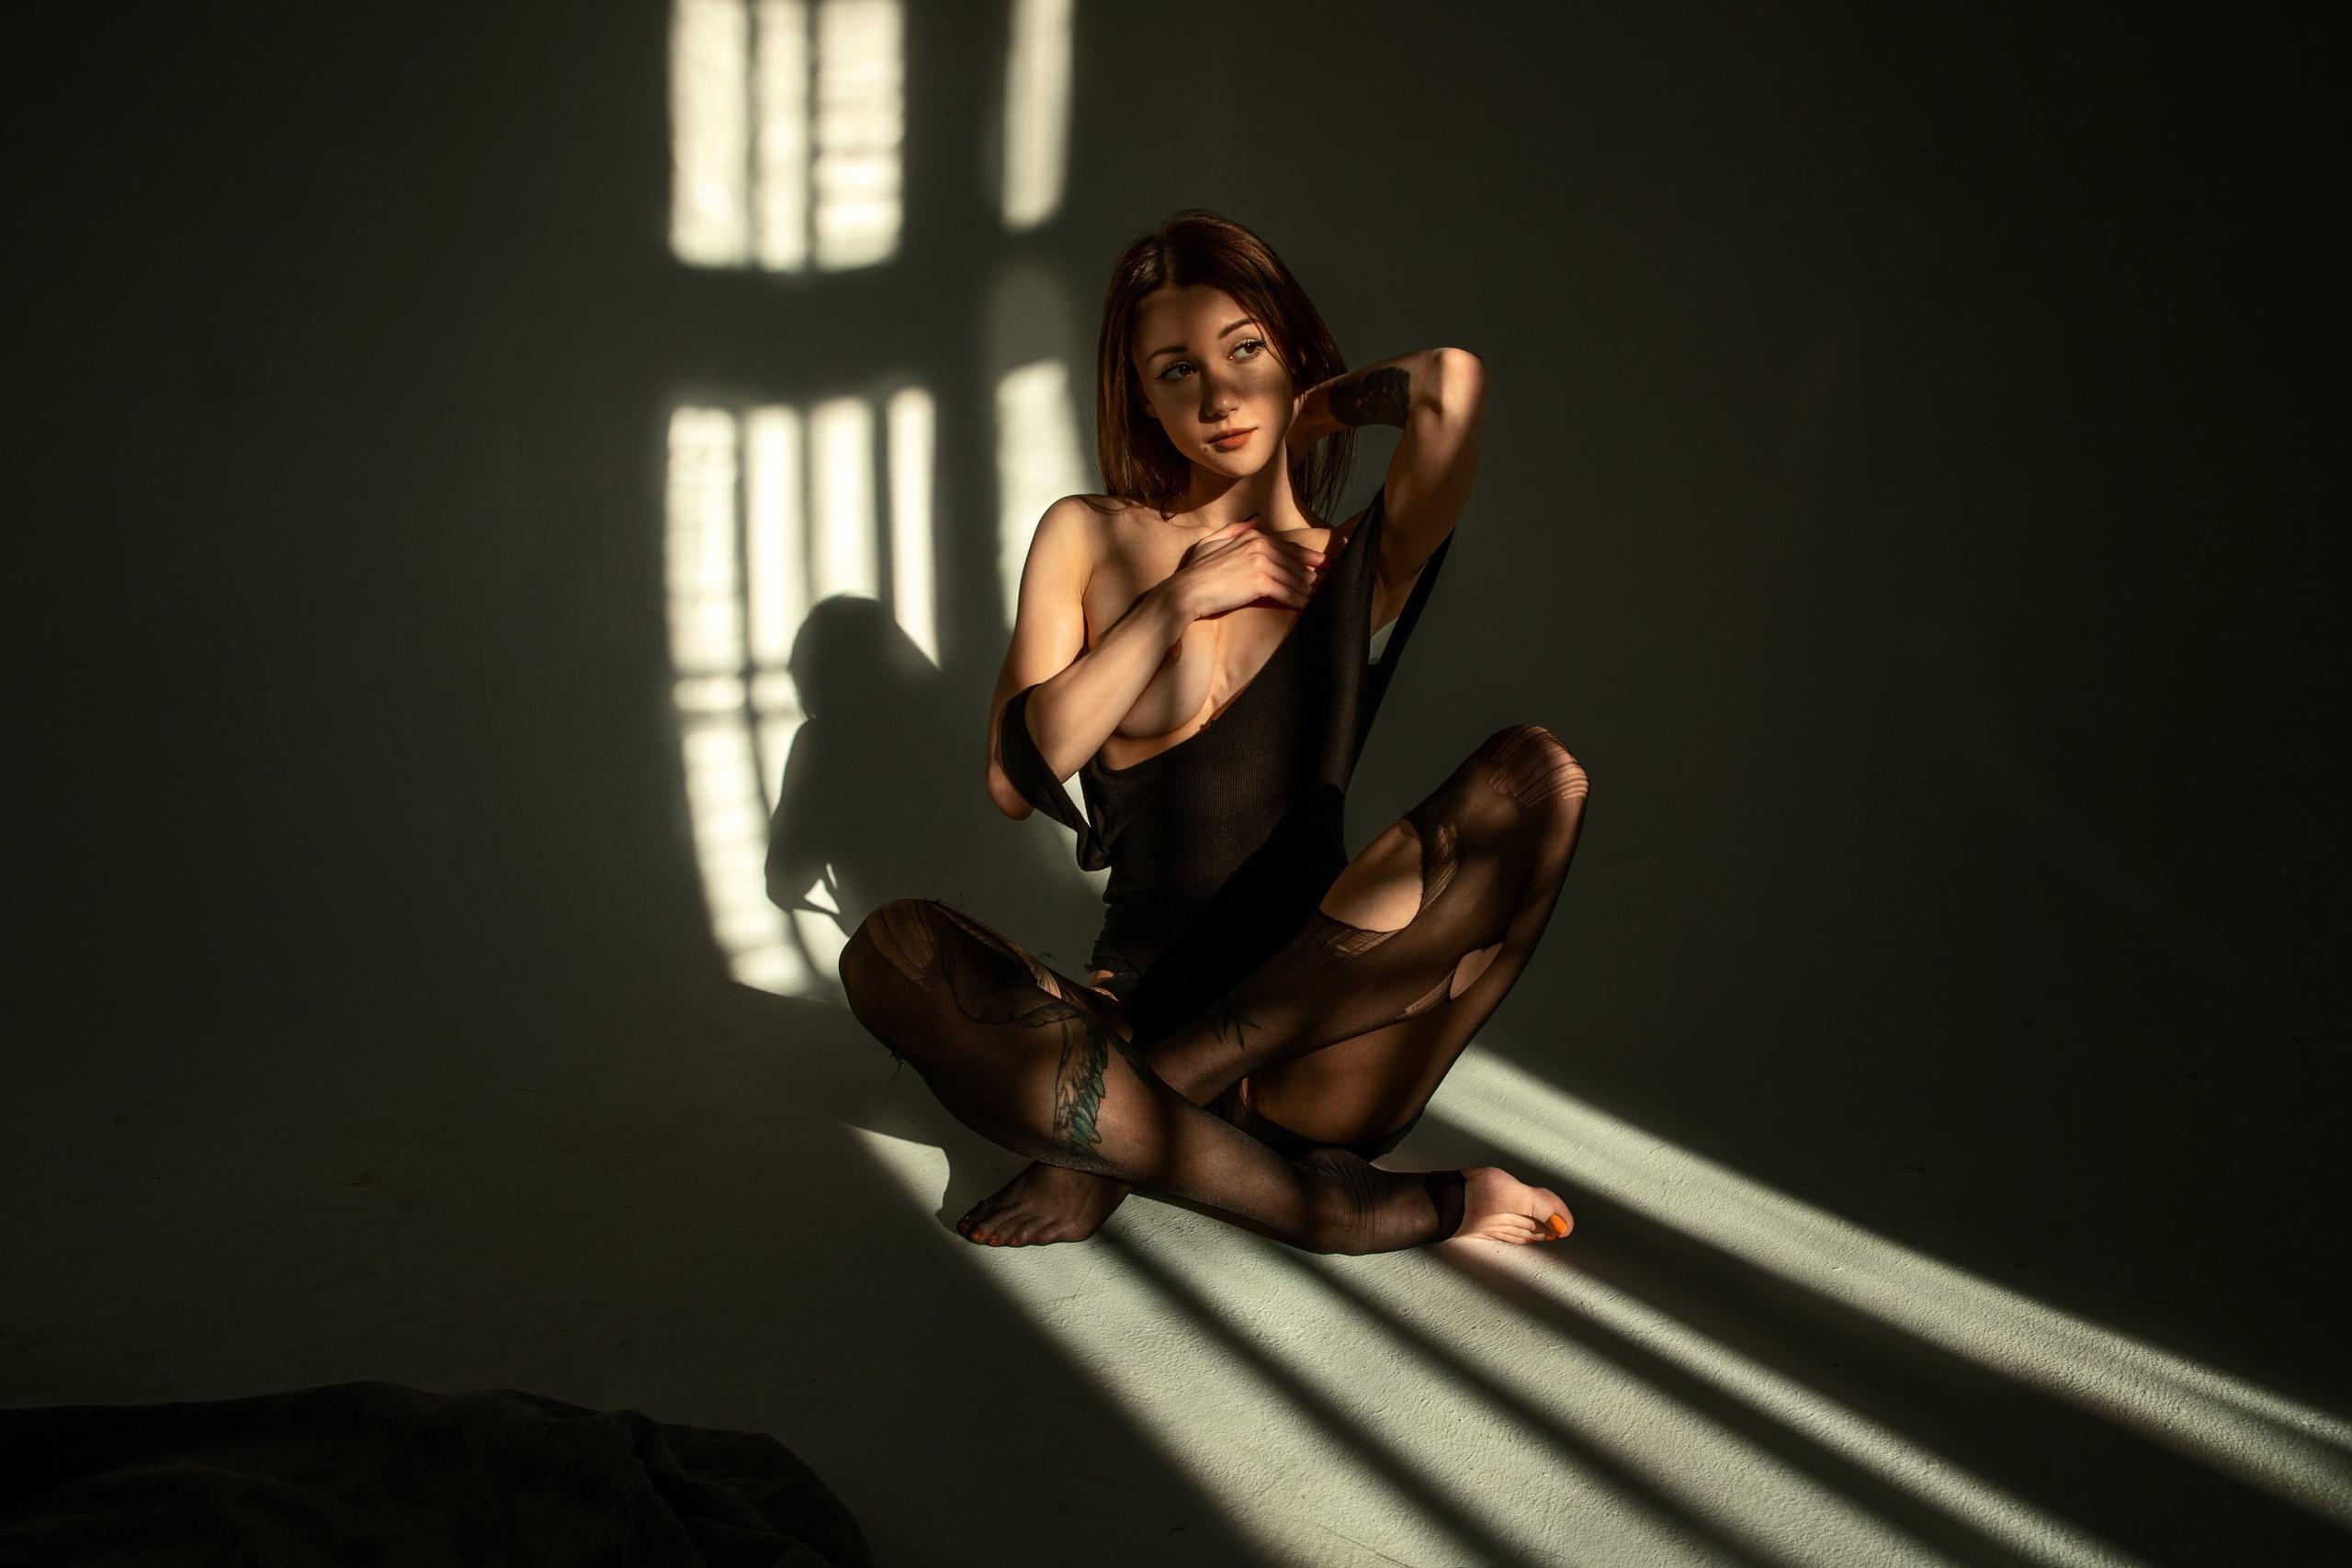 https://www.youngfolks.ru/pub/photographer-maks-pro-114968